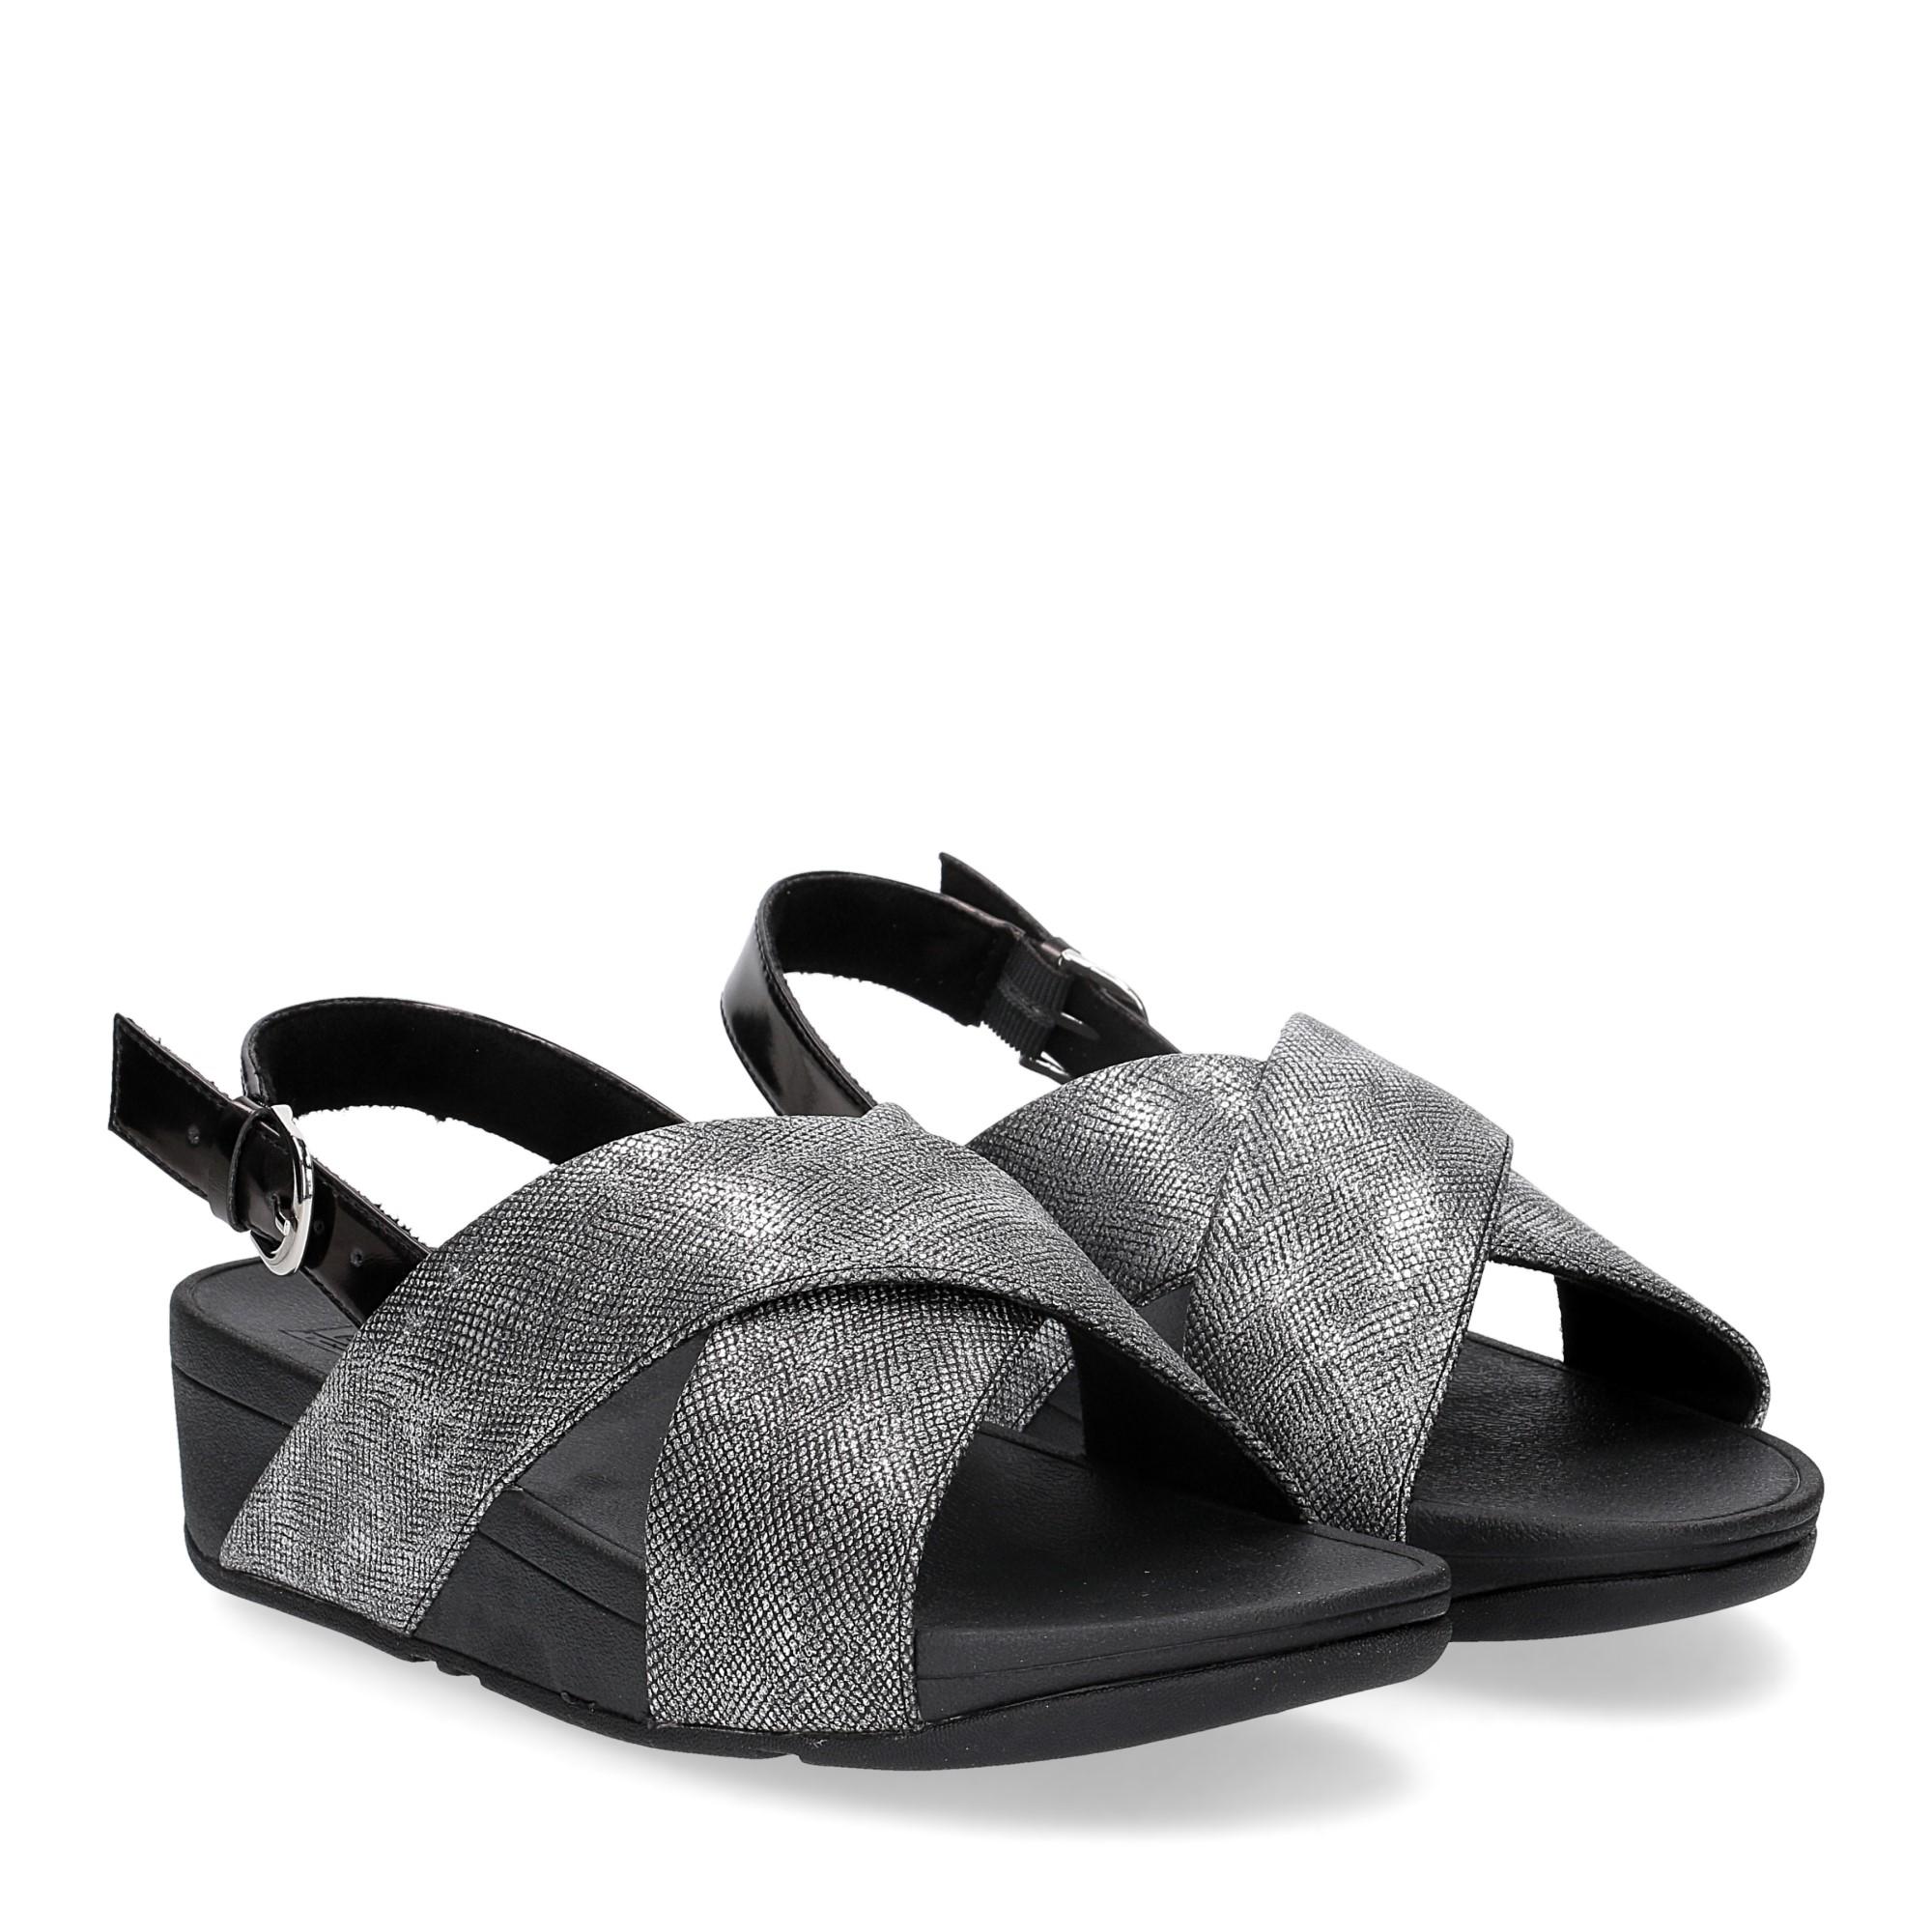 Fitflop Lulu Cross Back Strap Sandal shimmer print black